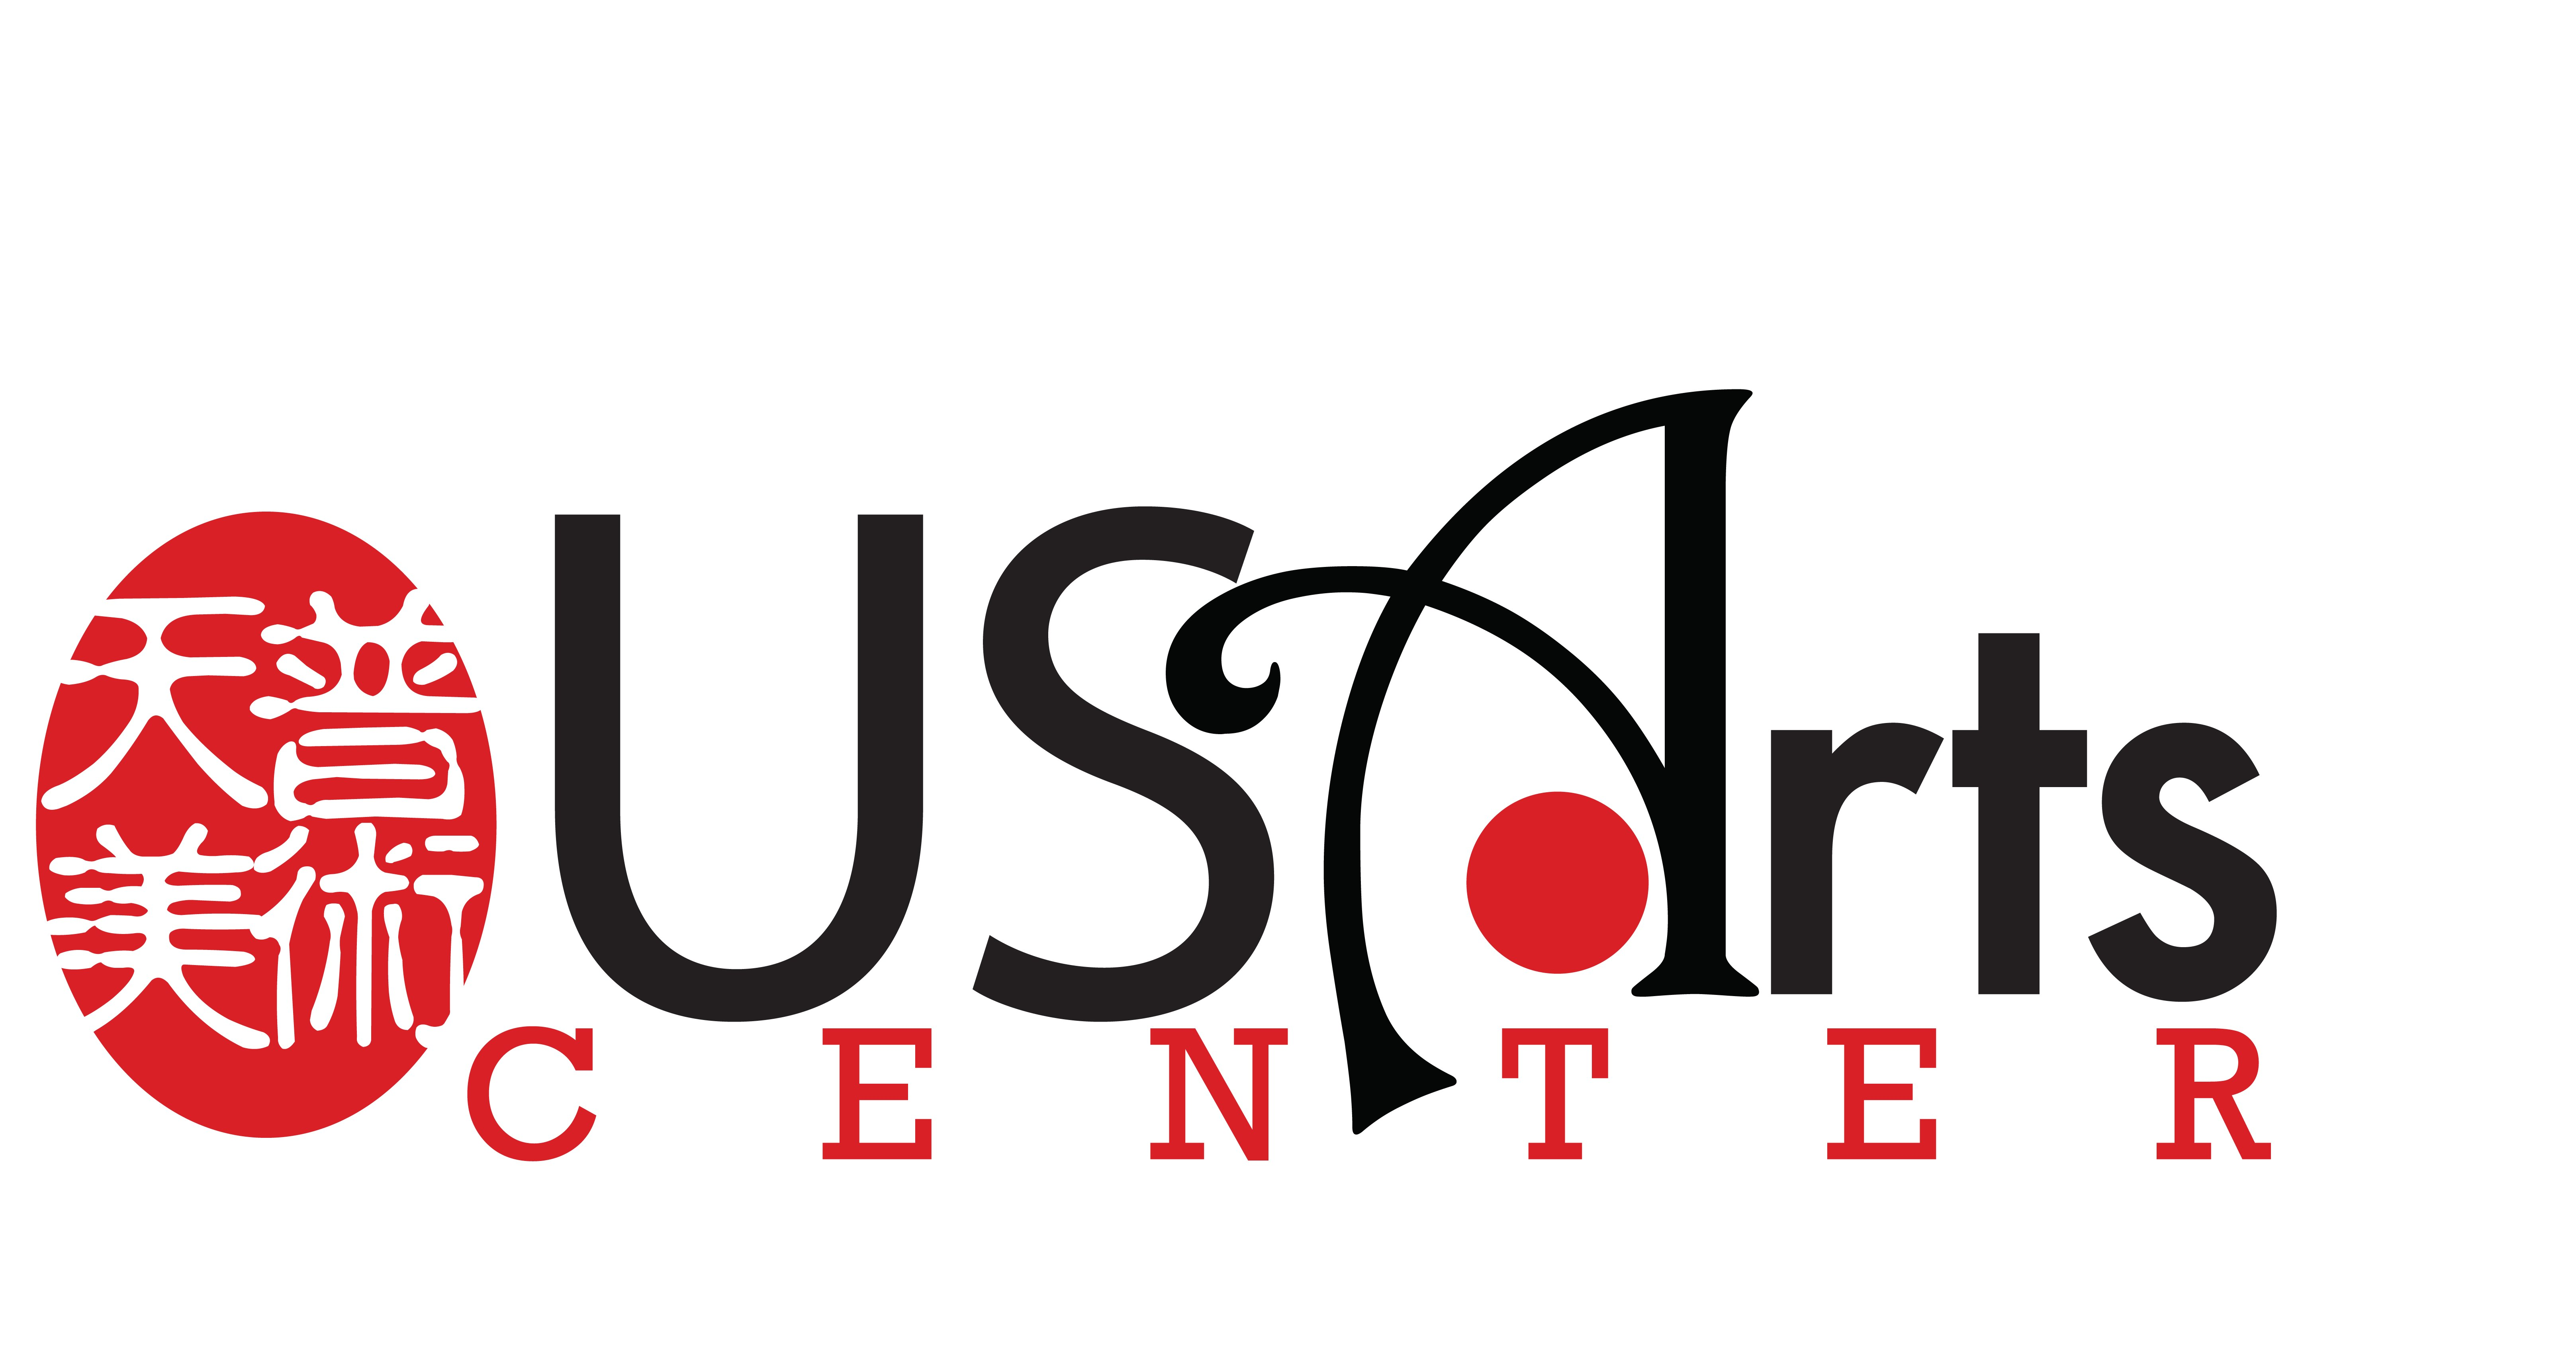 http://www.cinfoshare.org/education/summer-camps/2017-summer-camp-at-us-arts-center